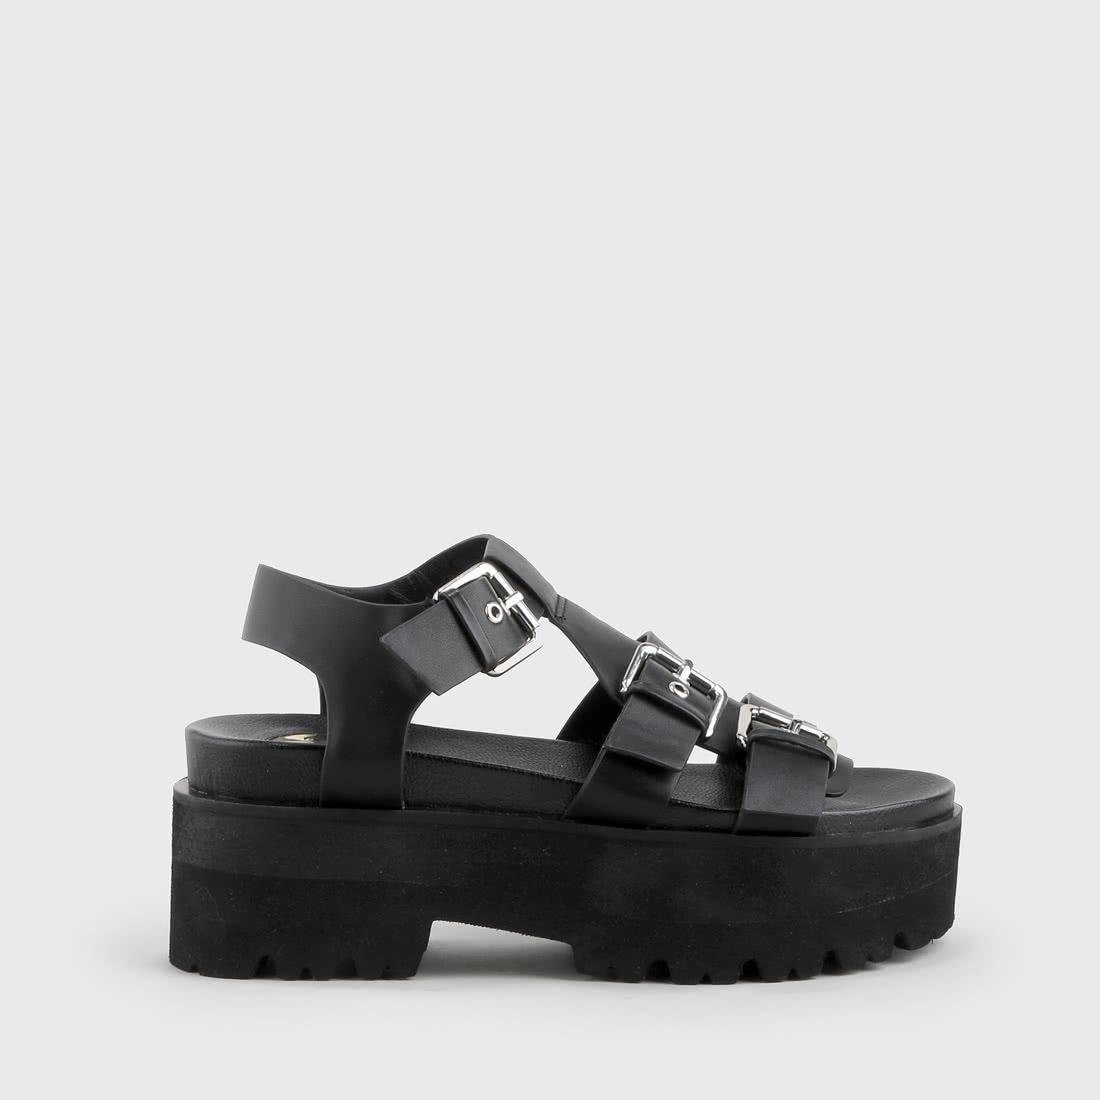 8e4d0b44aecb Elma Sandal Platform Black buy online in BUFFALO Online-Shop